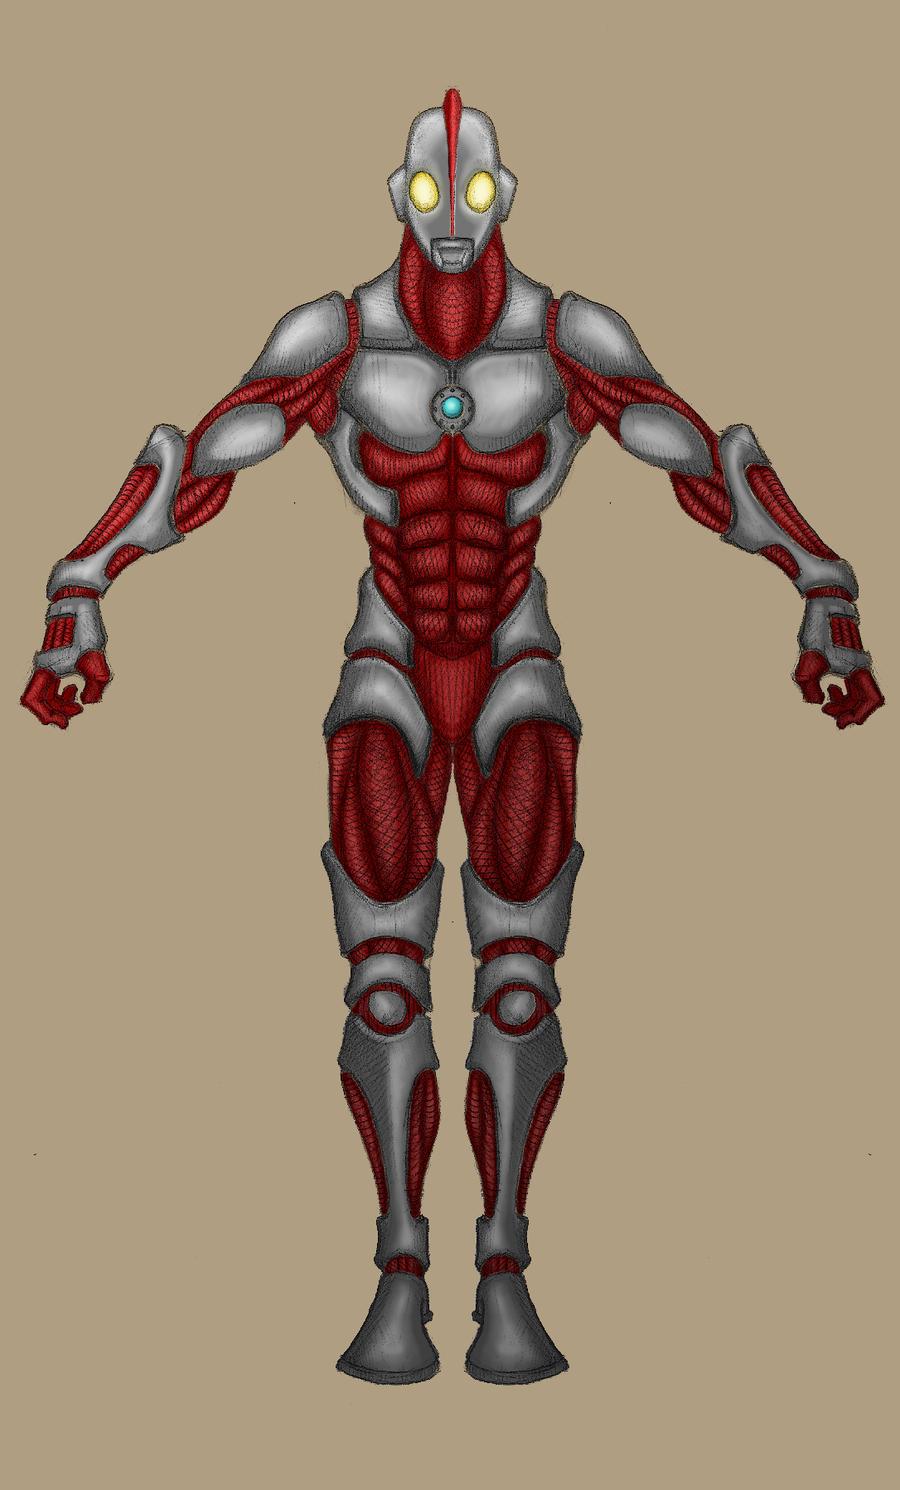 Ultraman by sentinel245 on deviantart